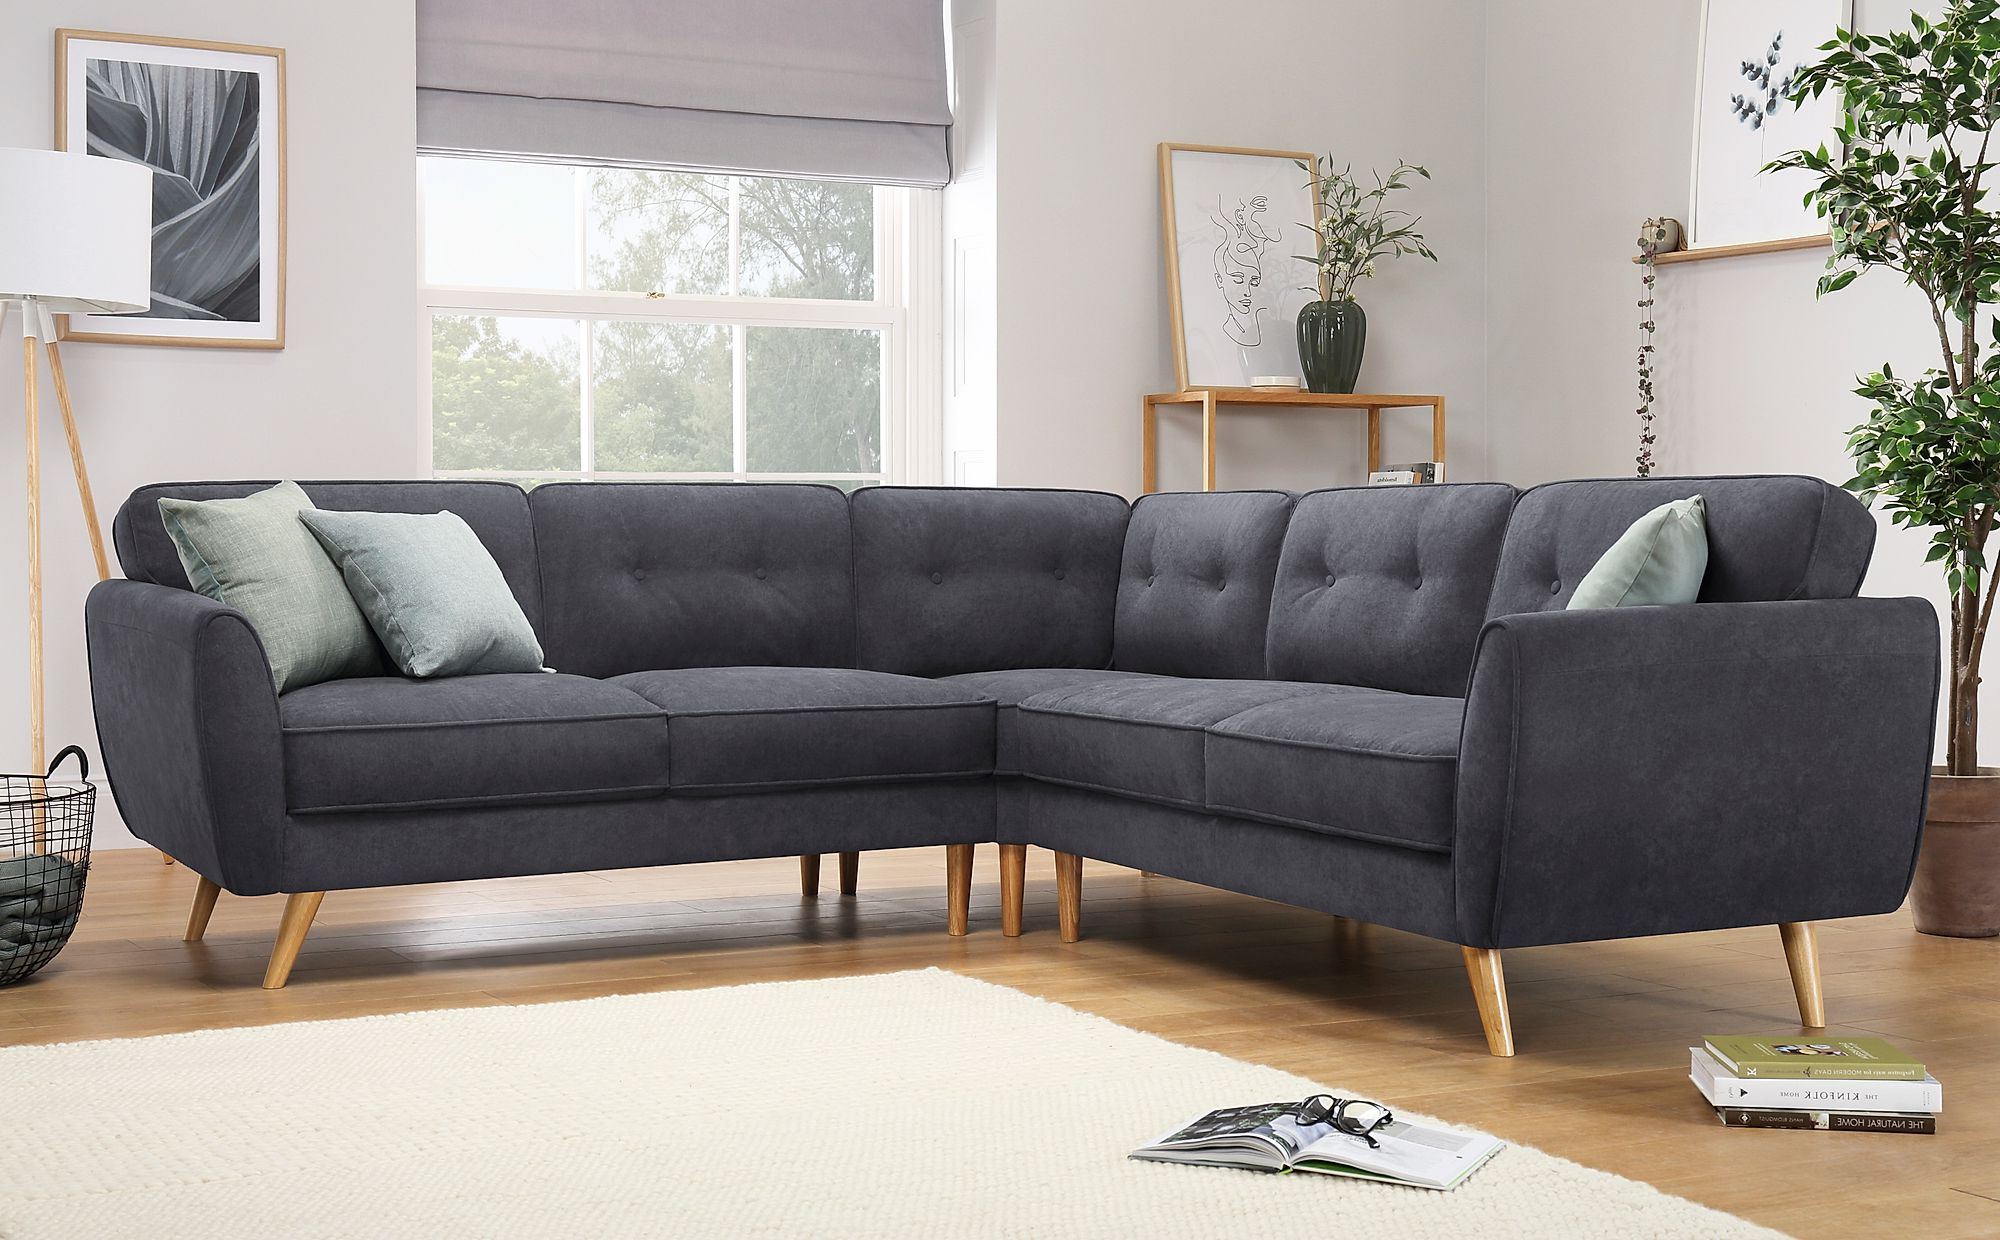 Most Popular Harlow Slate Grey Plush Fabric Corner Sofa (View 2 of 20)